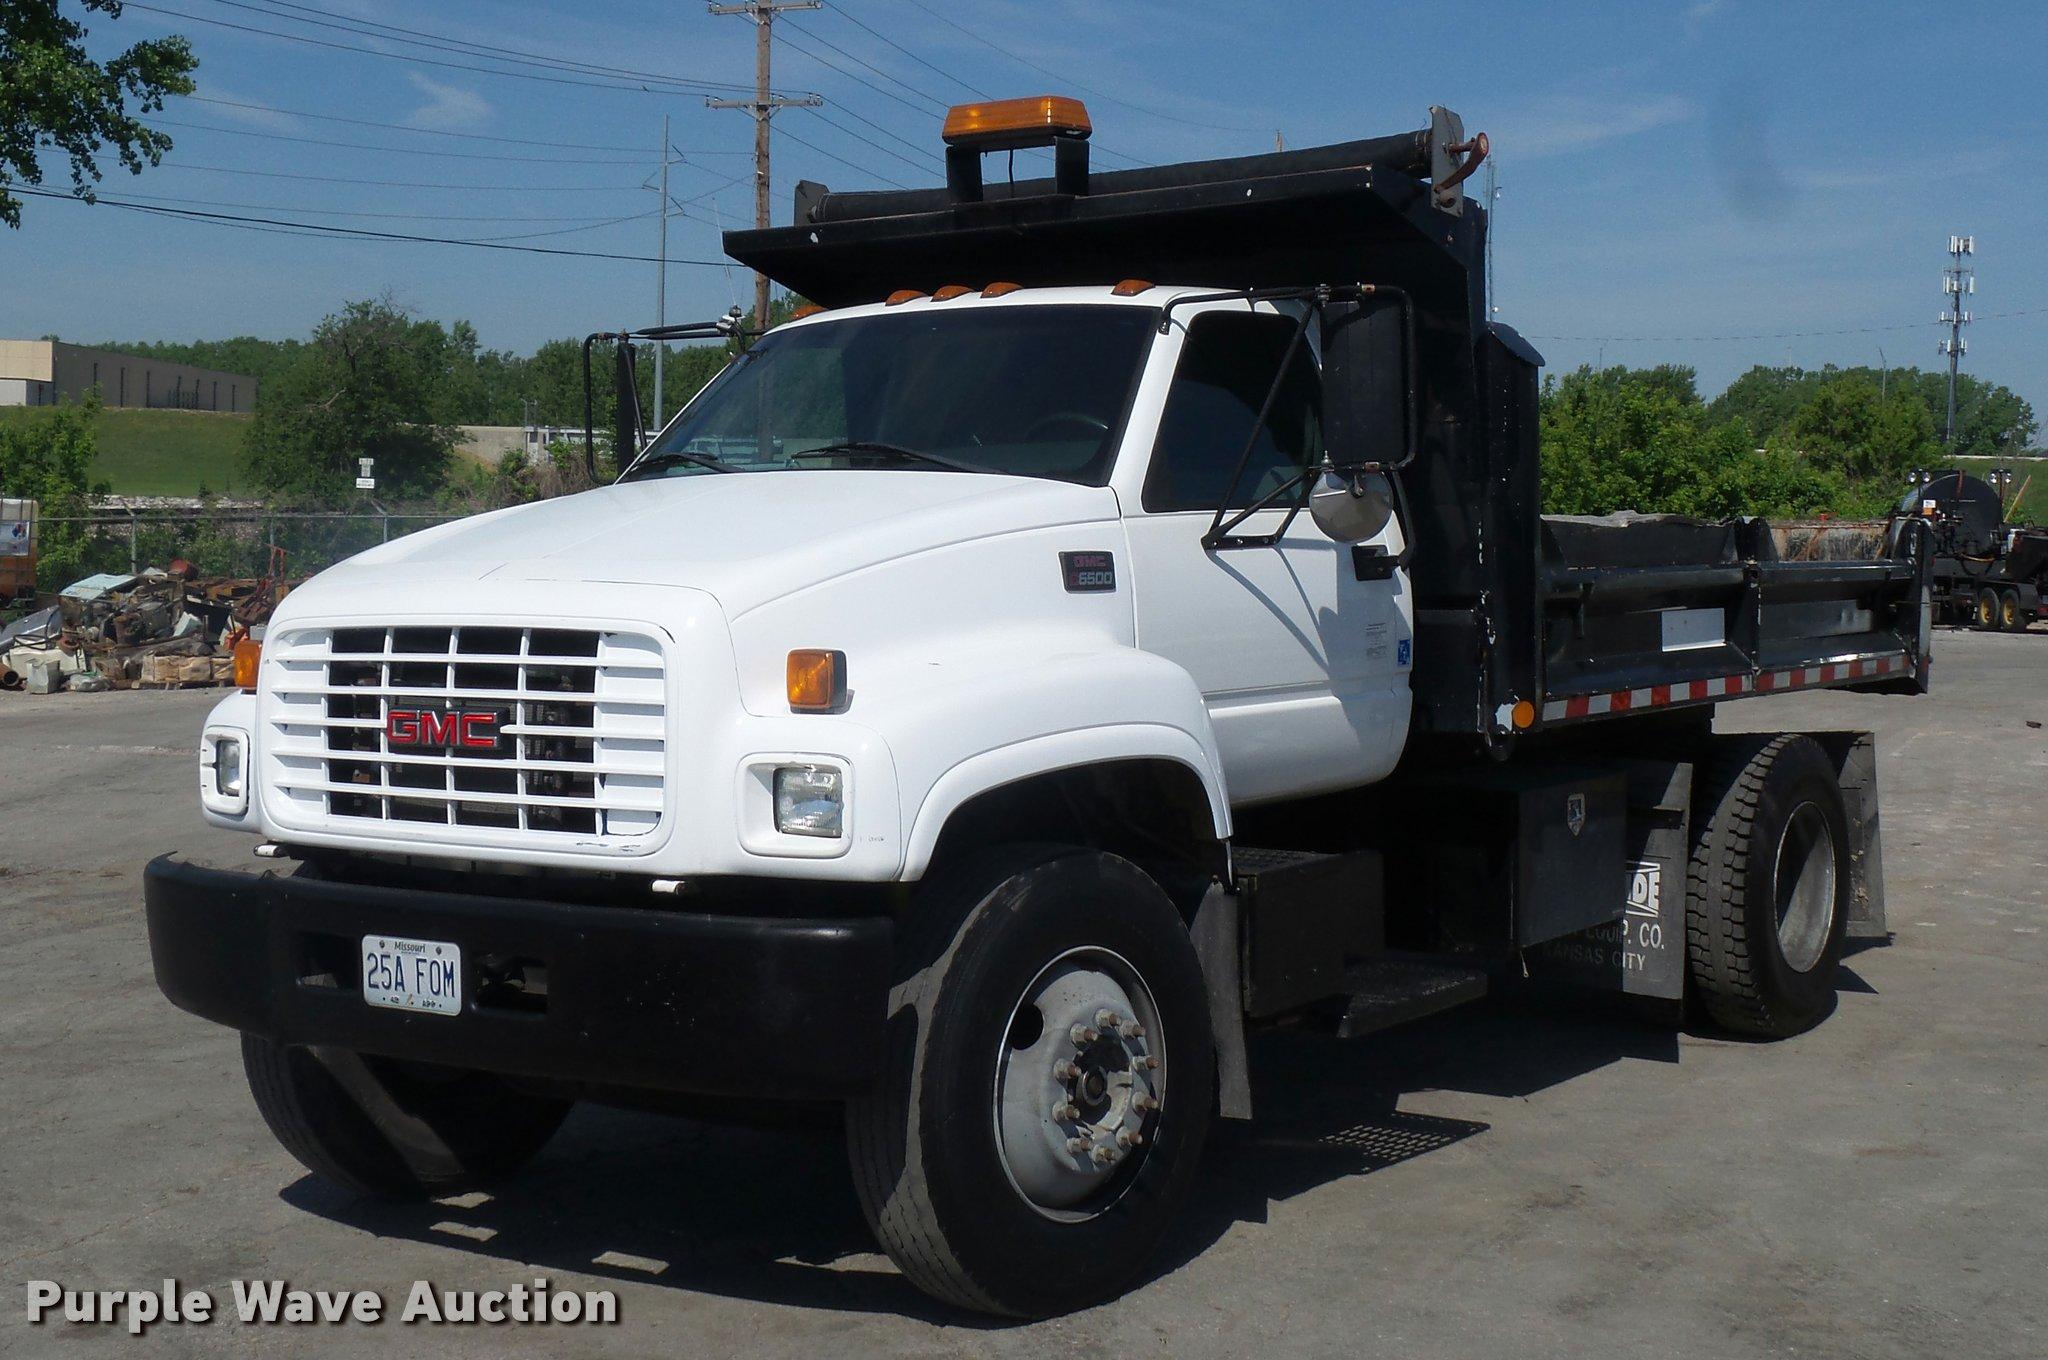 2001 gmc c6500 dump truck item dd9475 sold june 22 cons rh purplewave com Blueprints for 2001 GMC Blueprints for 2001 GMC